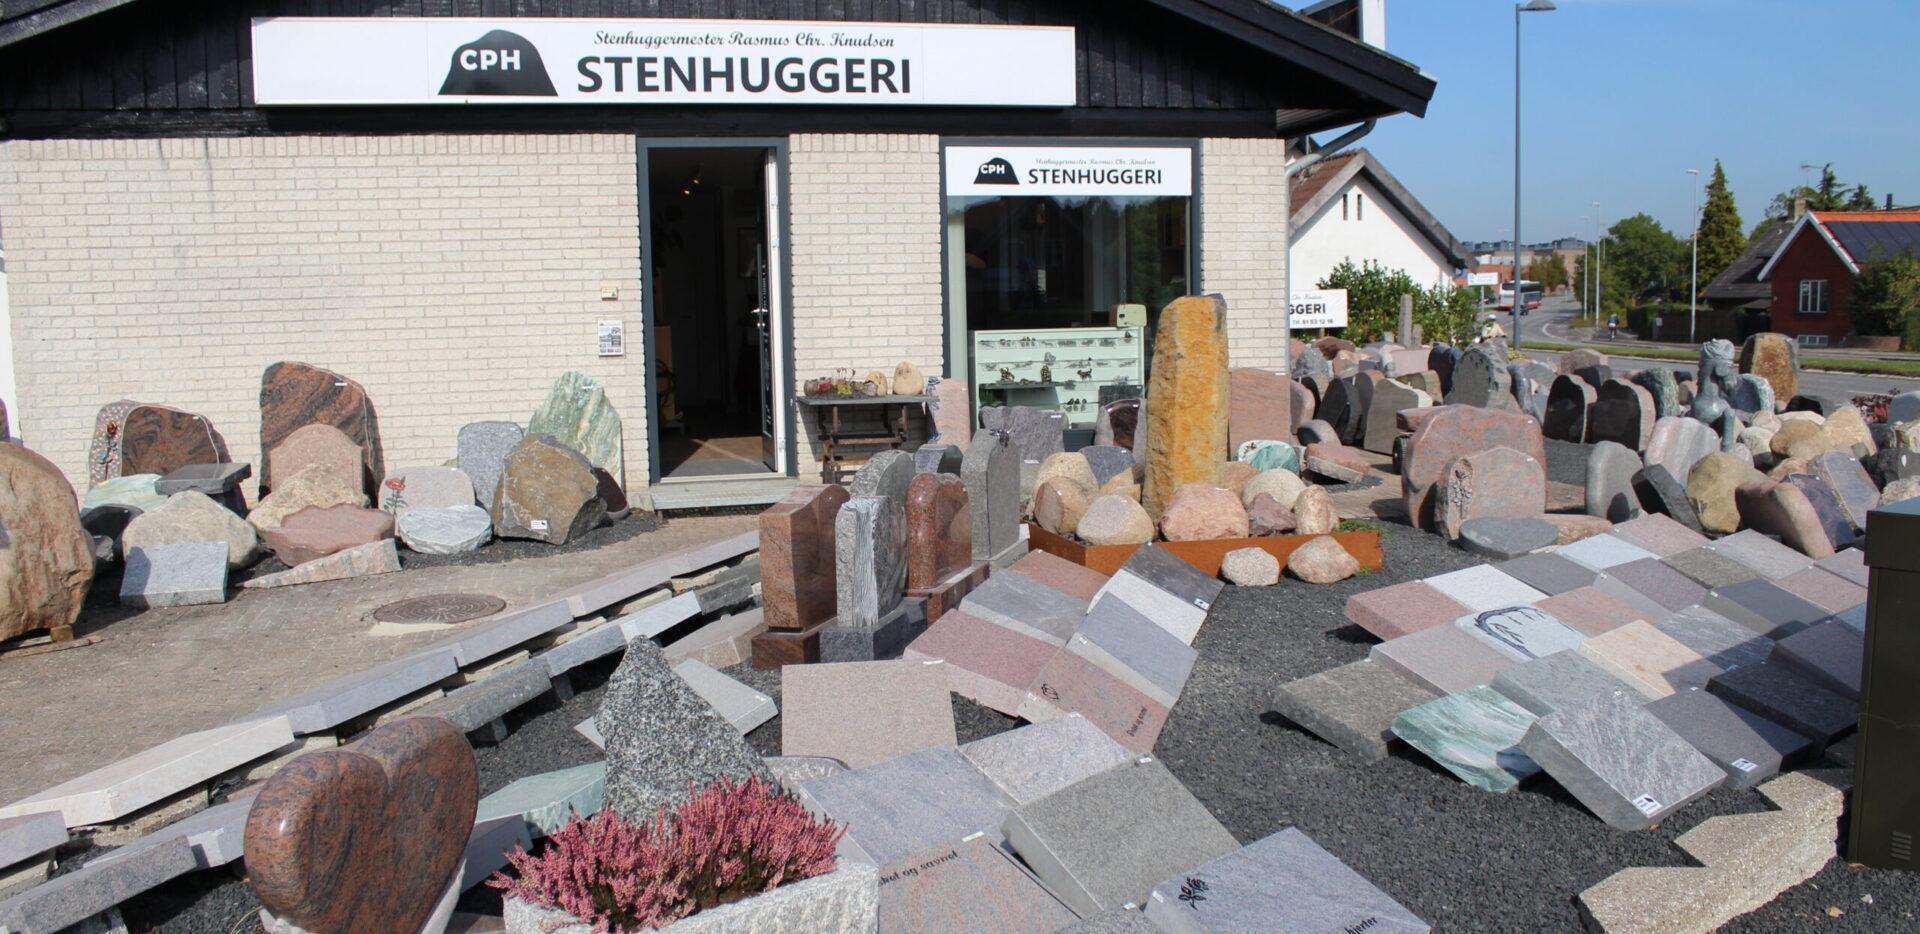 CPH Stenhuggeri